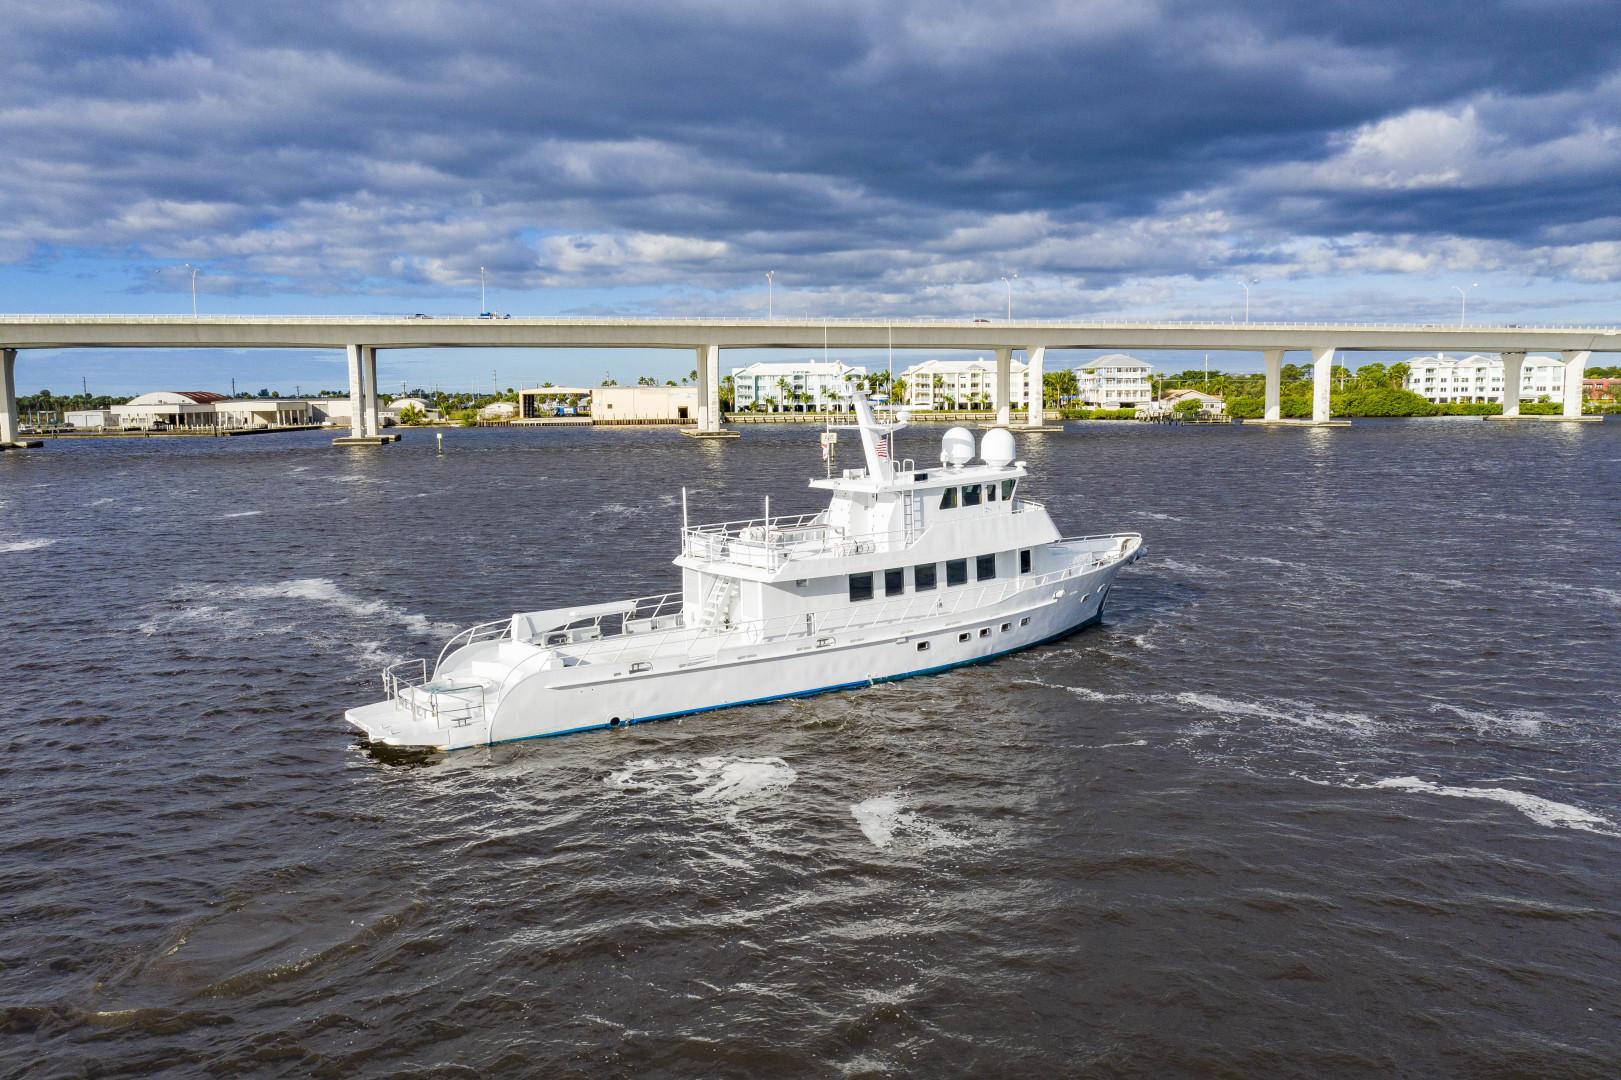 GlassTech-Expedition Yacht 2018-Reset Stuart-Florida-United States-Profile-1568539 | Thumbnail